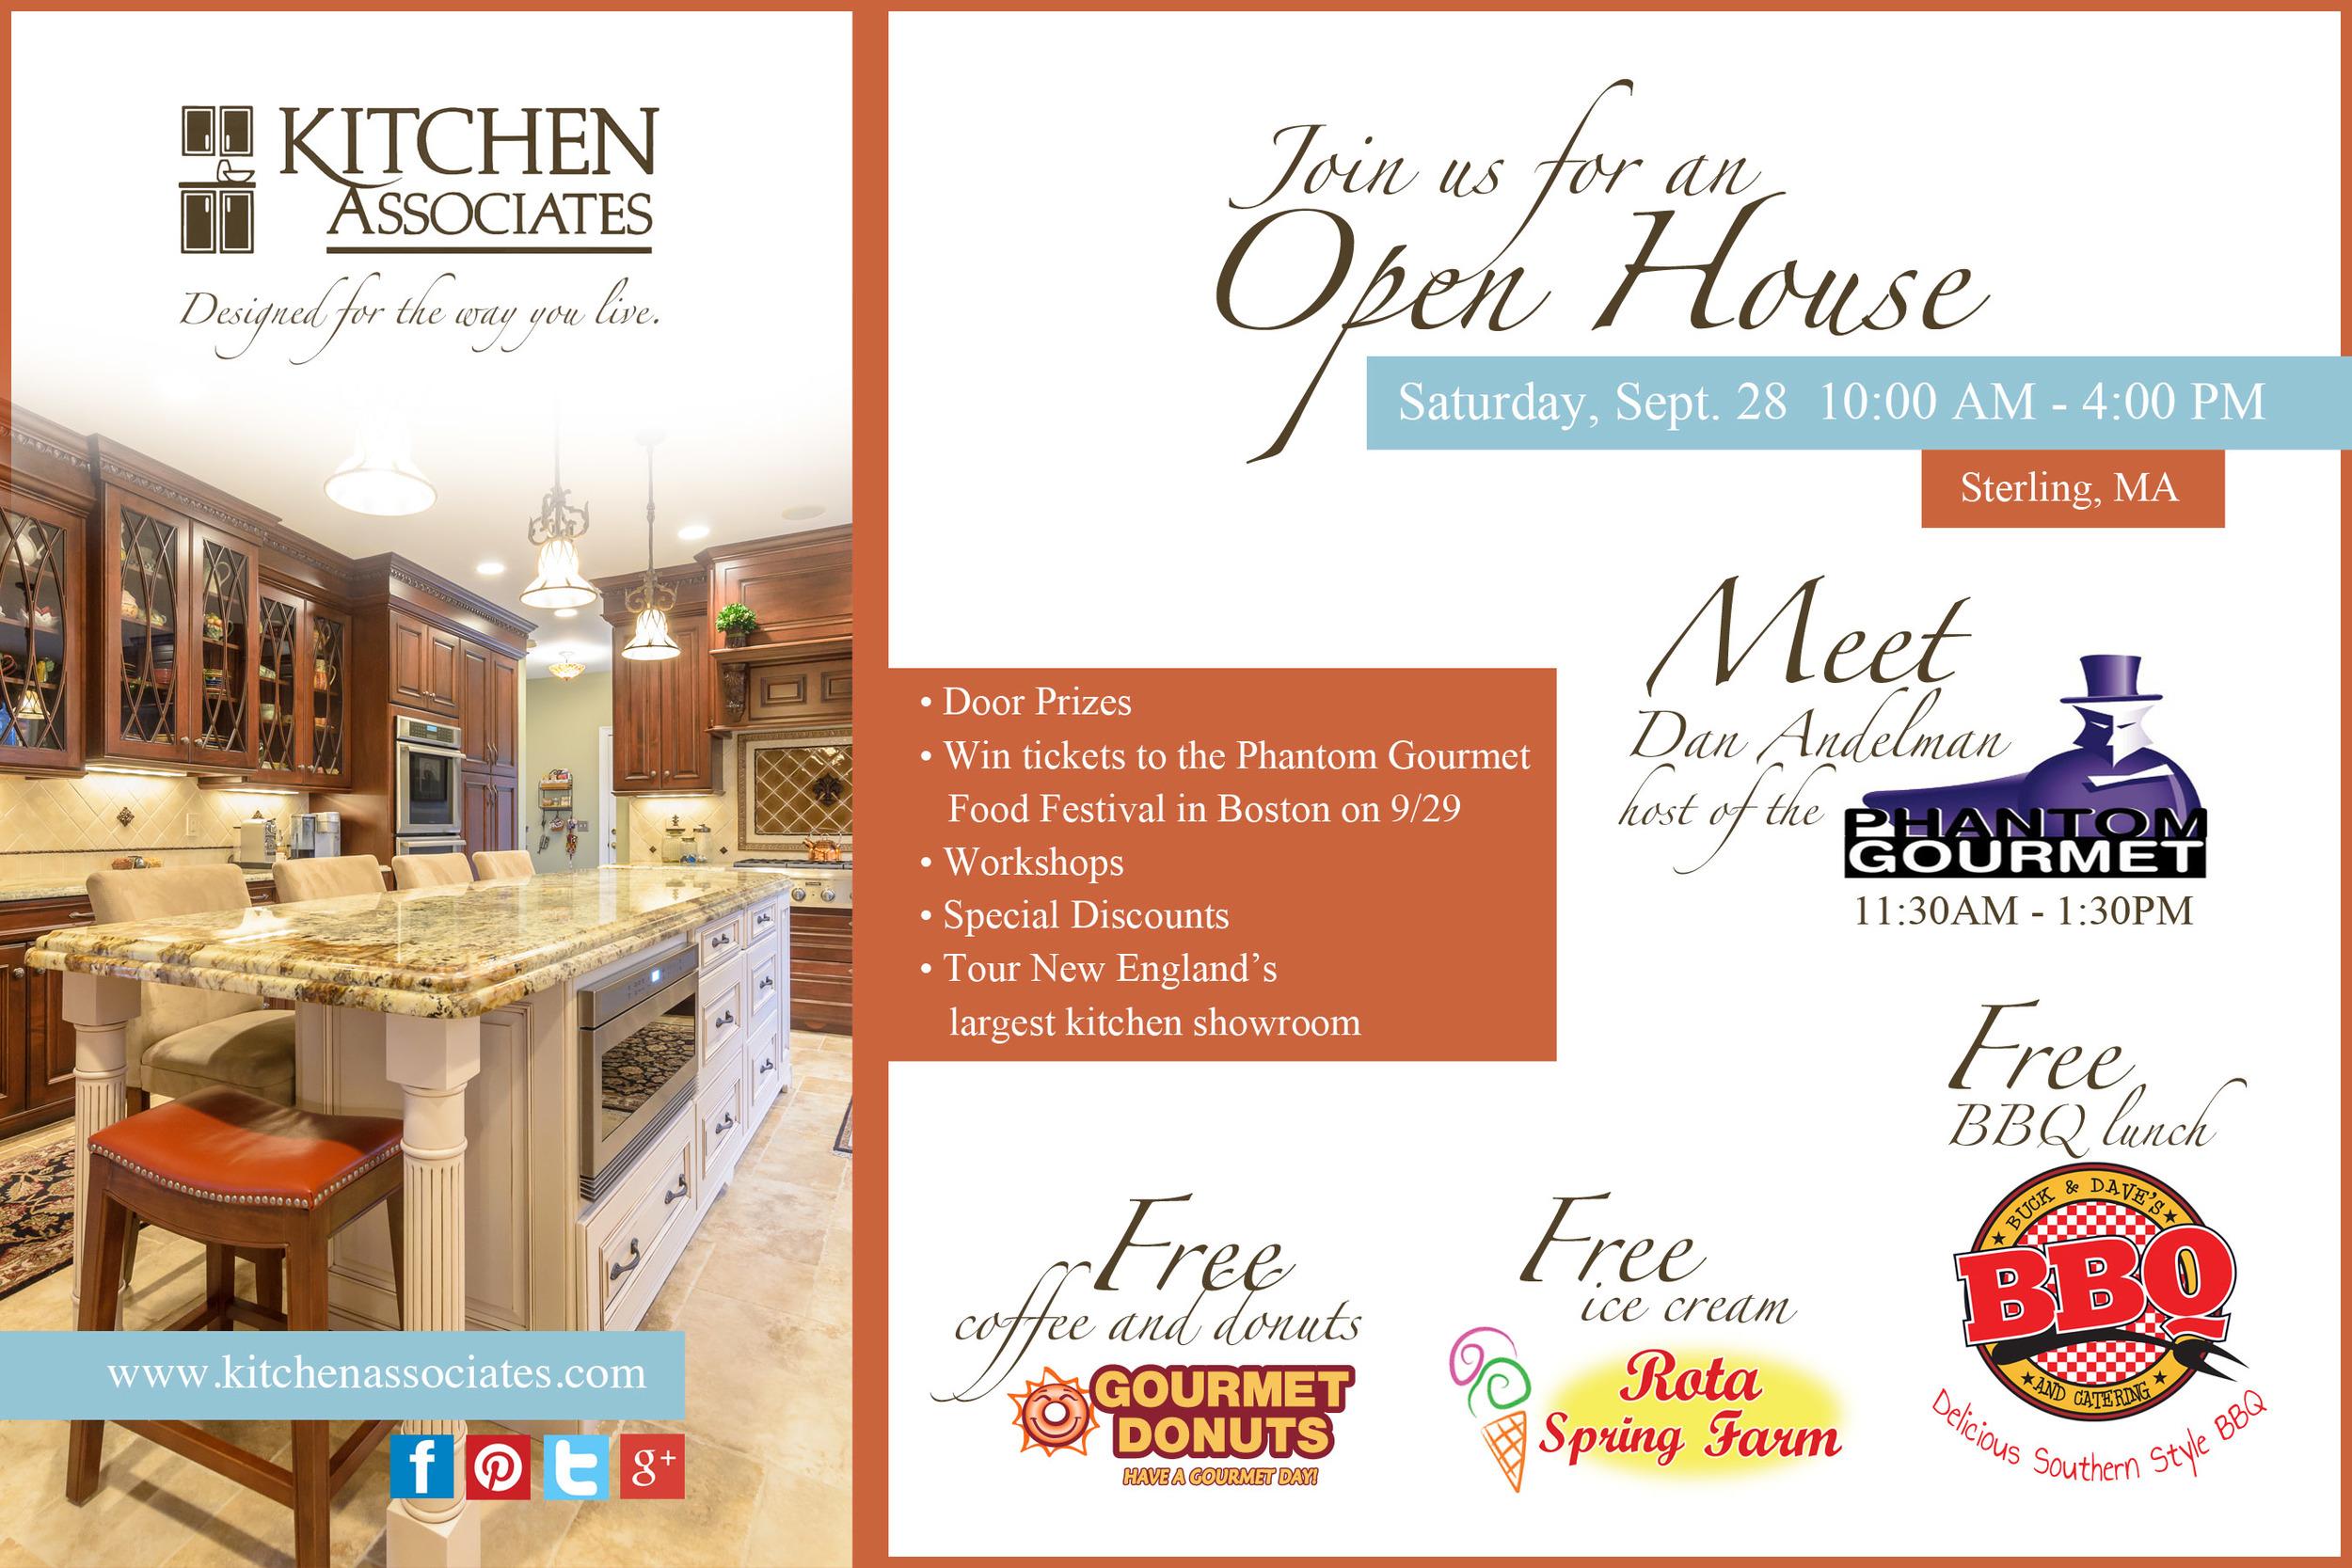 Kitchen_Associates_Open_House.jpg